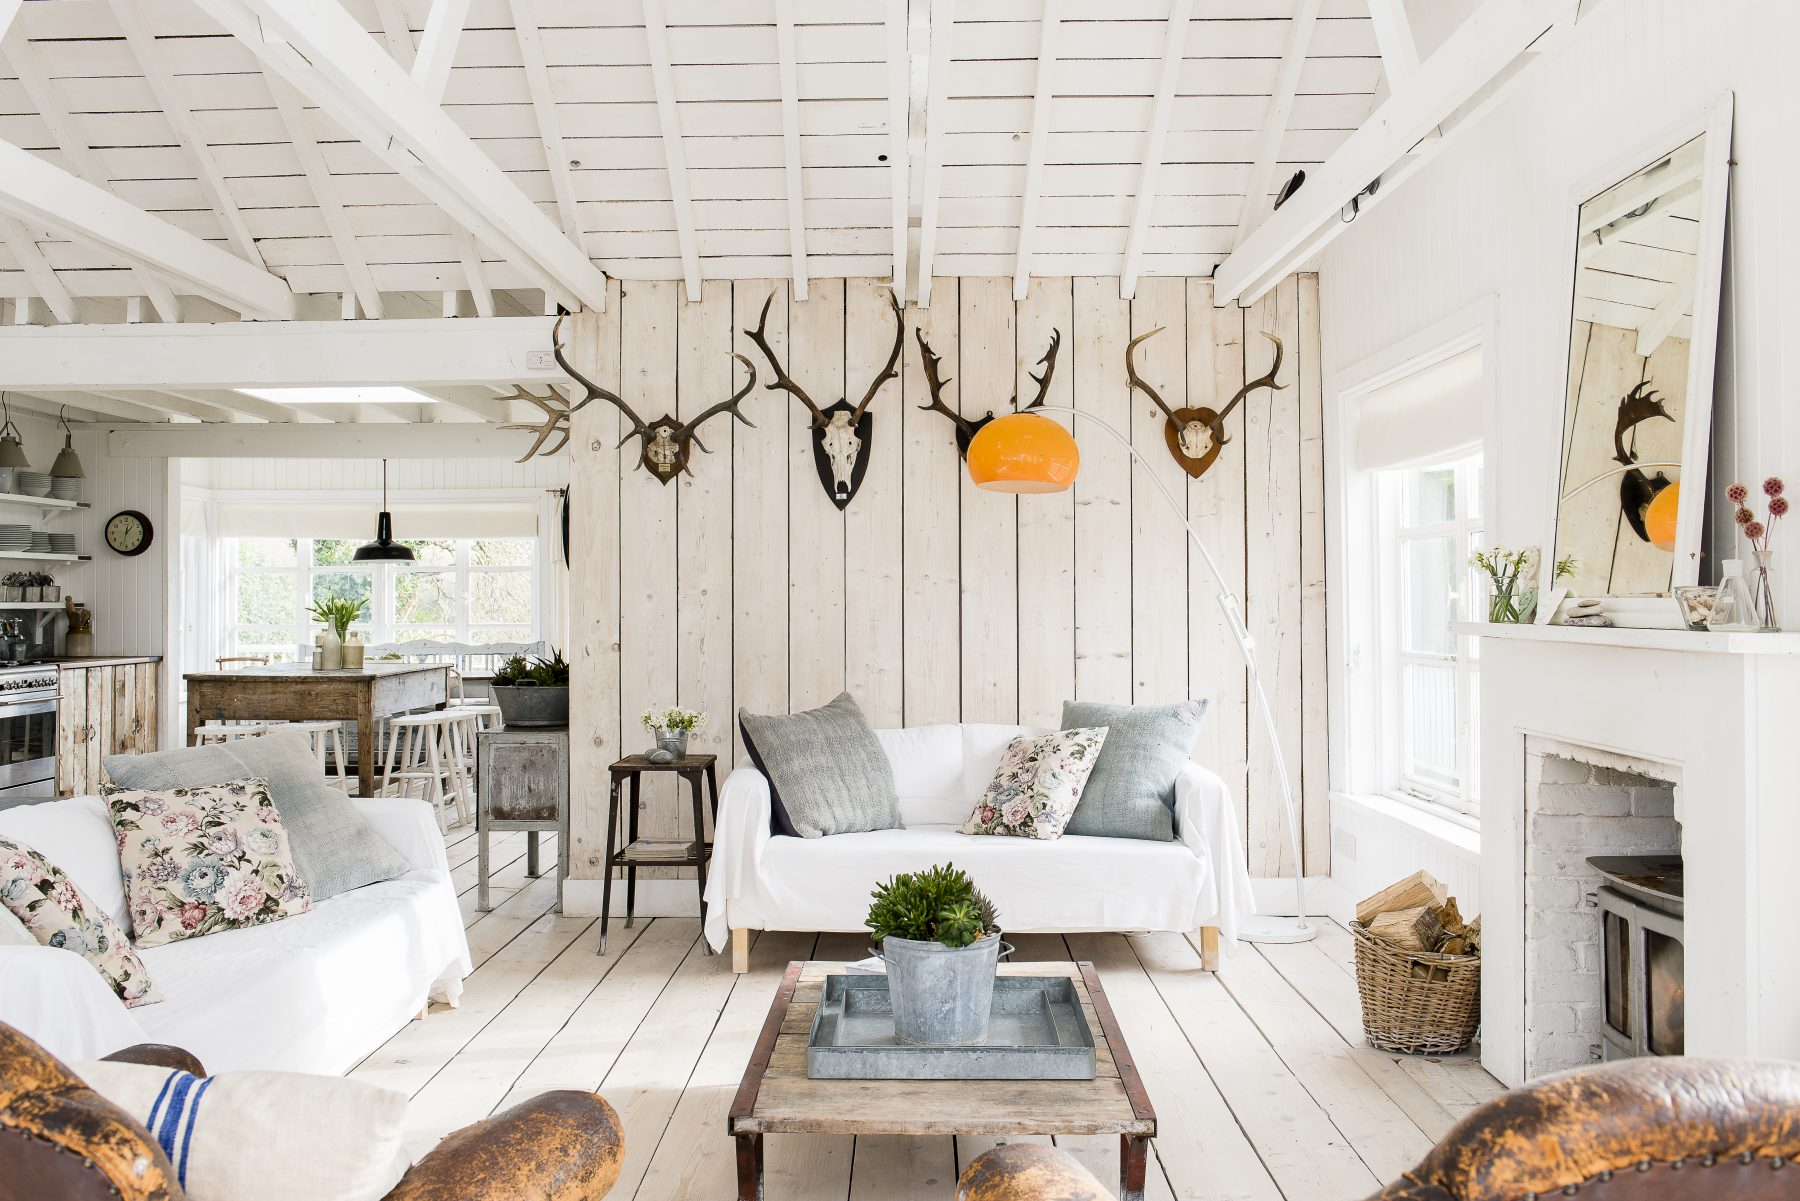 New england style beach house priceless magazines for Pezzi di arredamento